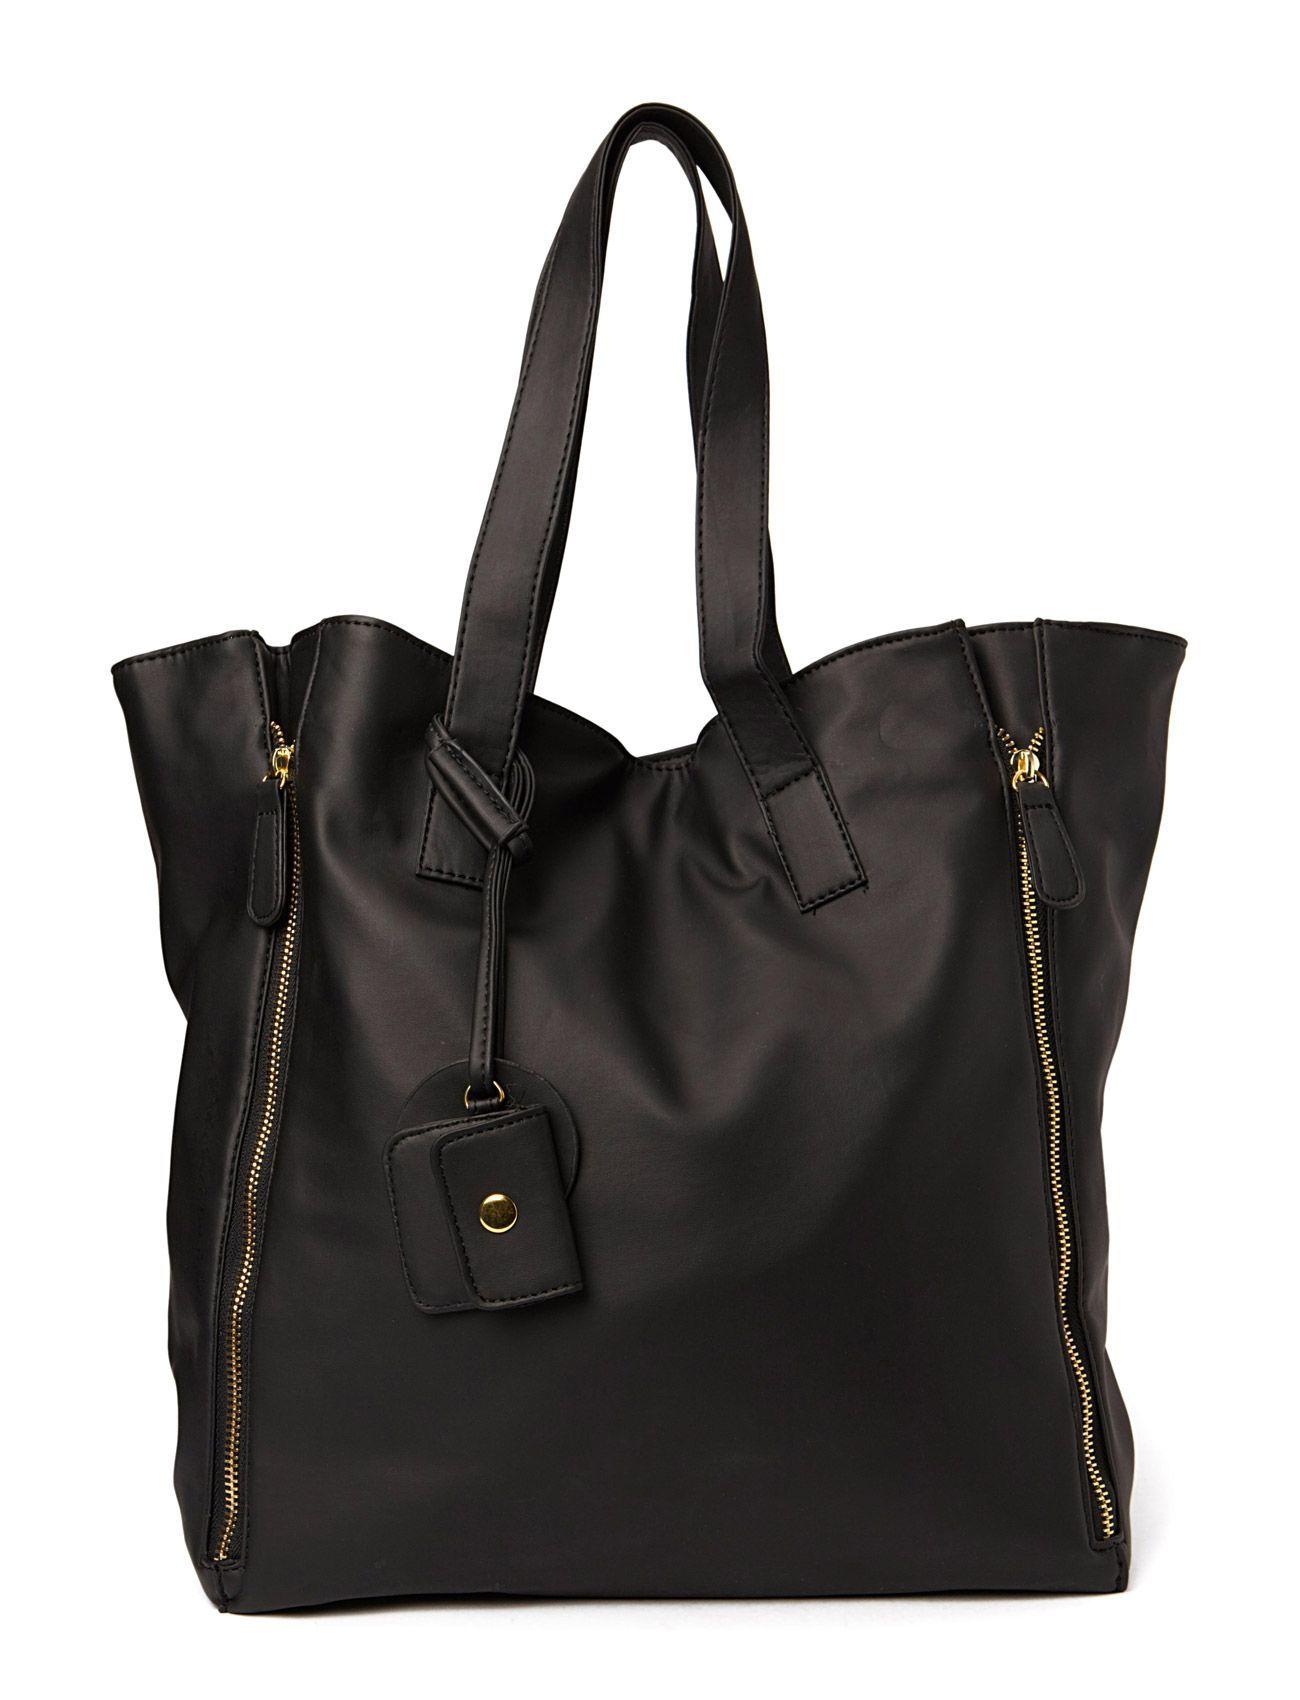 Friis & Company Bixx bag